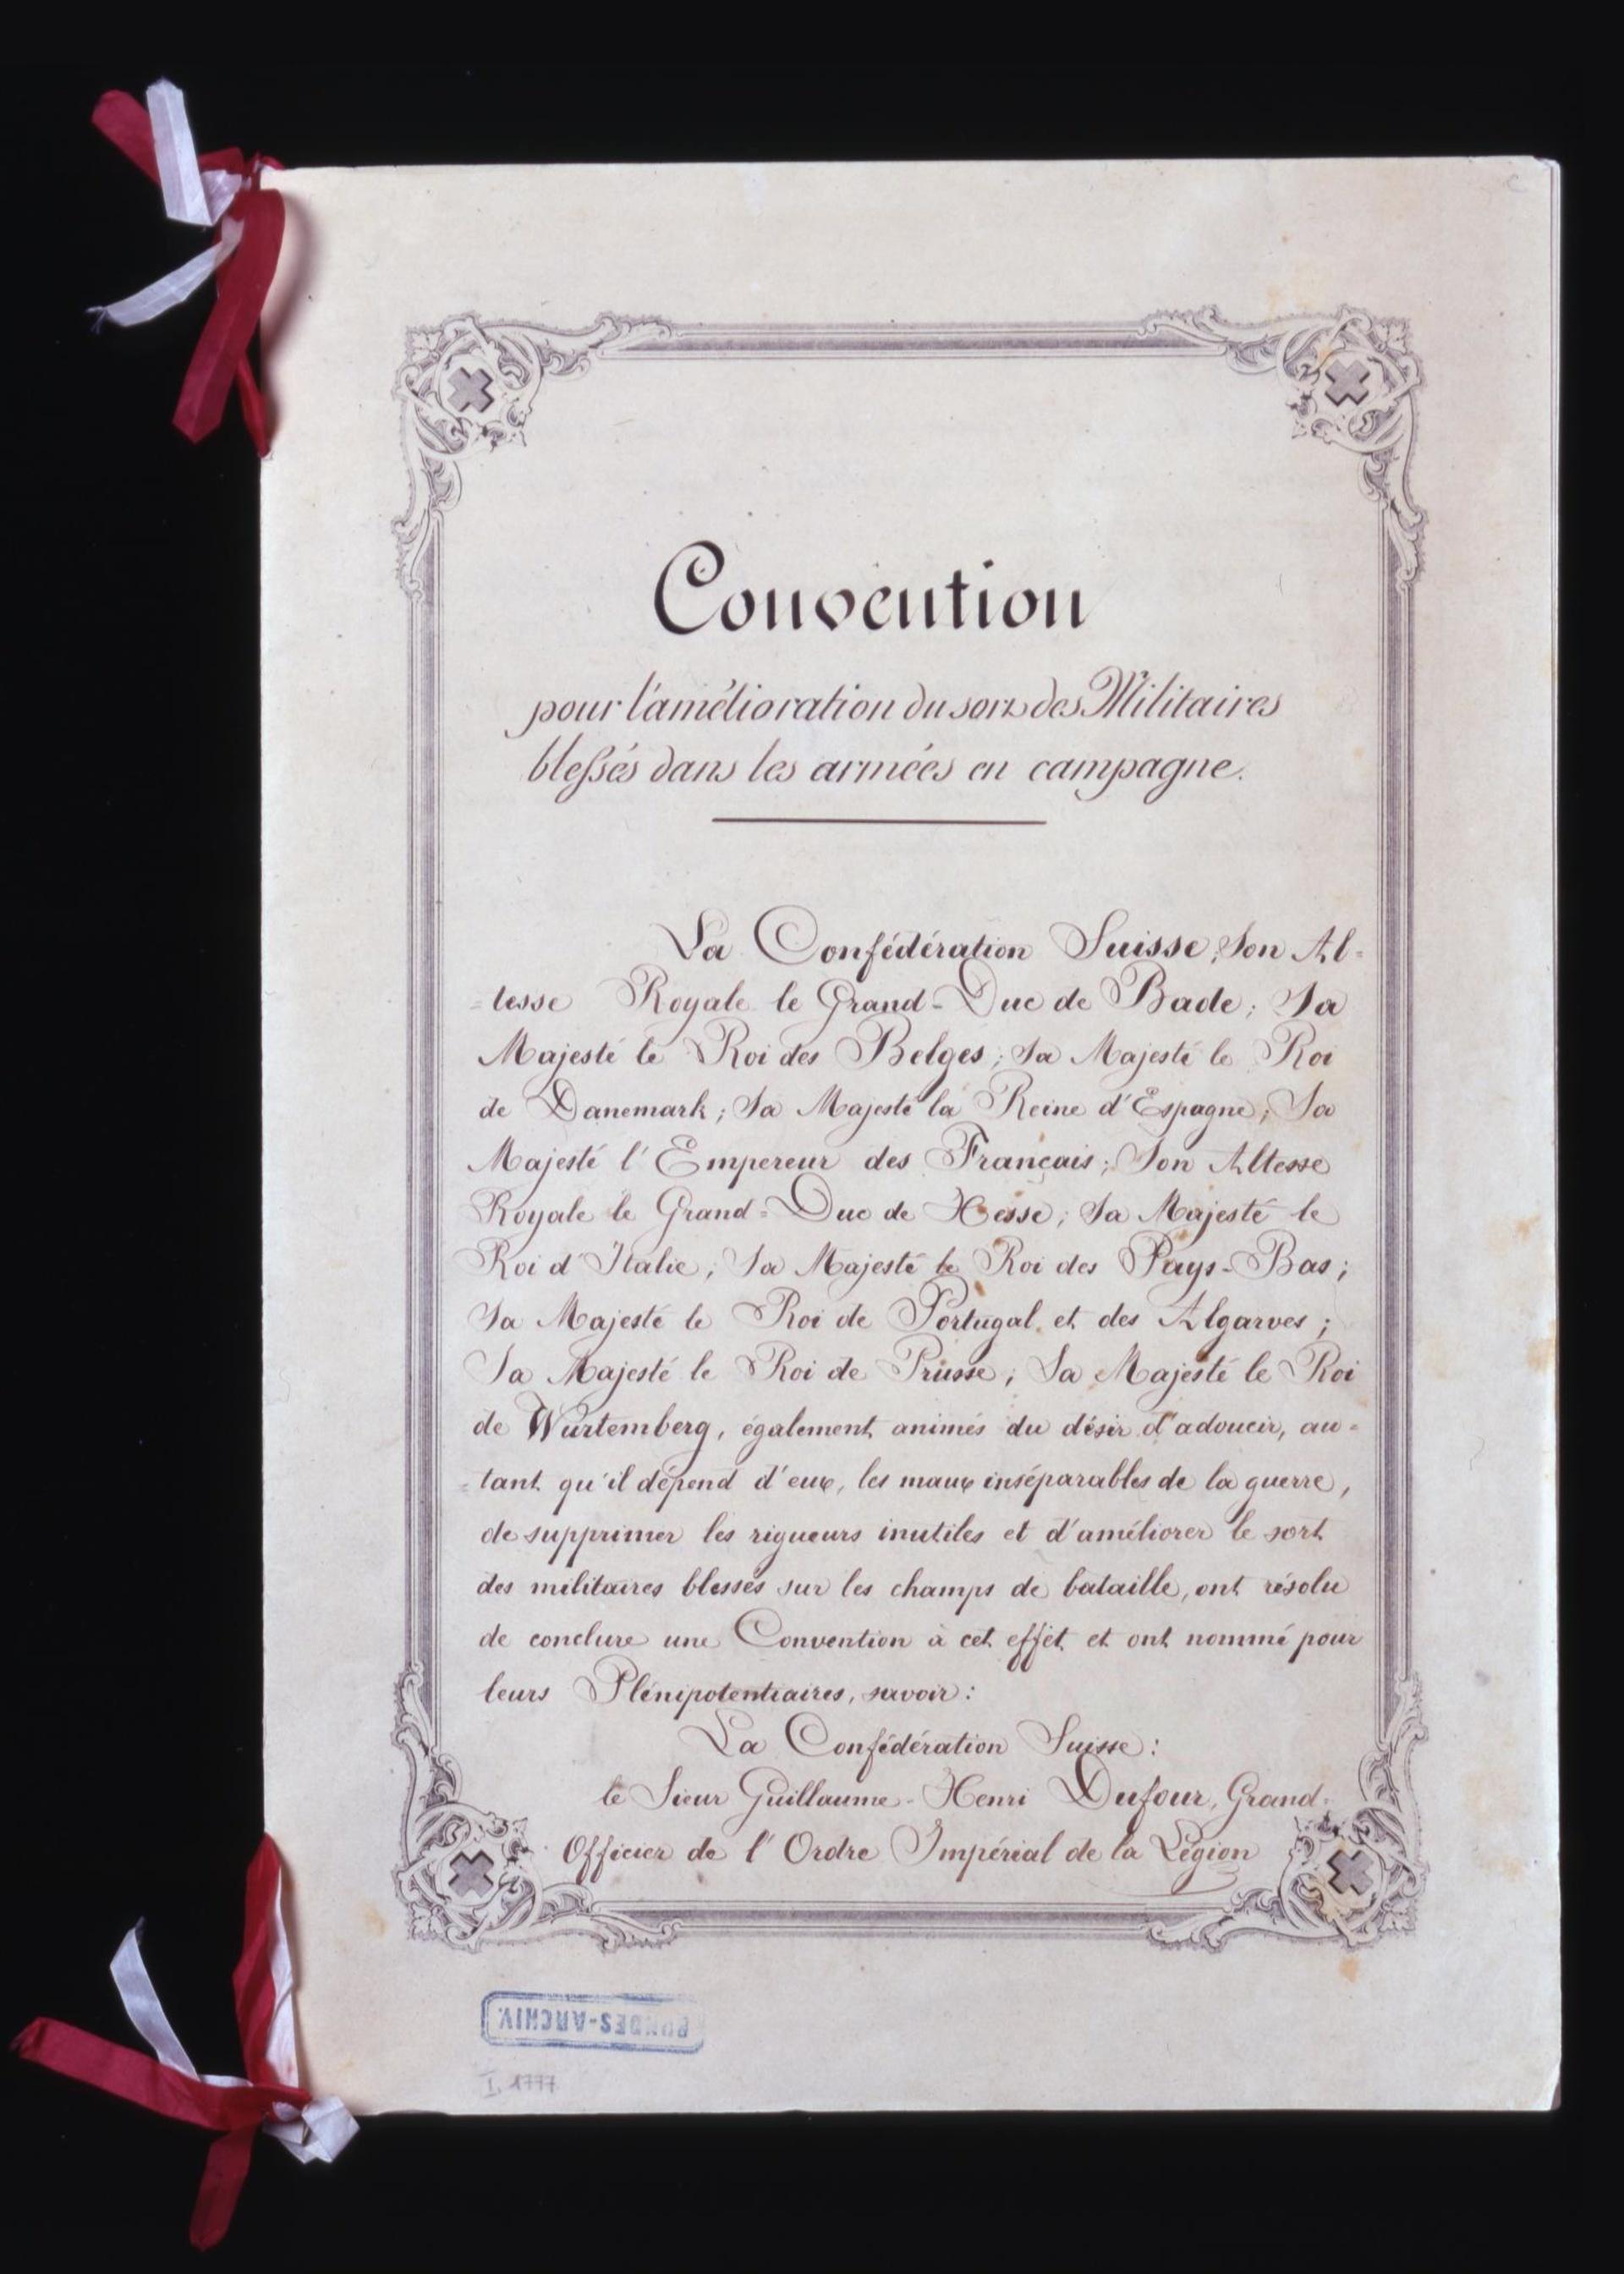 1951 refugee convention pdf wikipedia